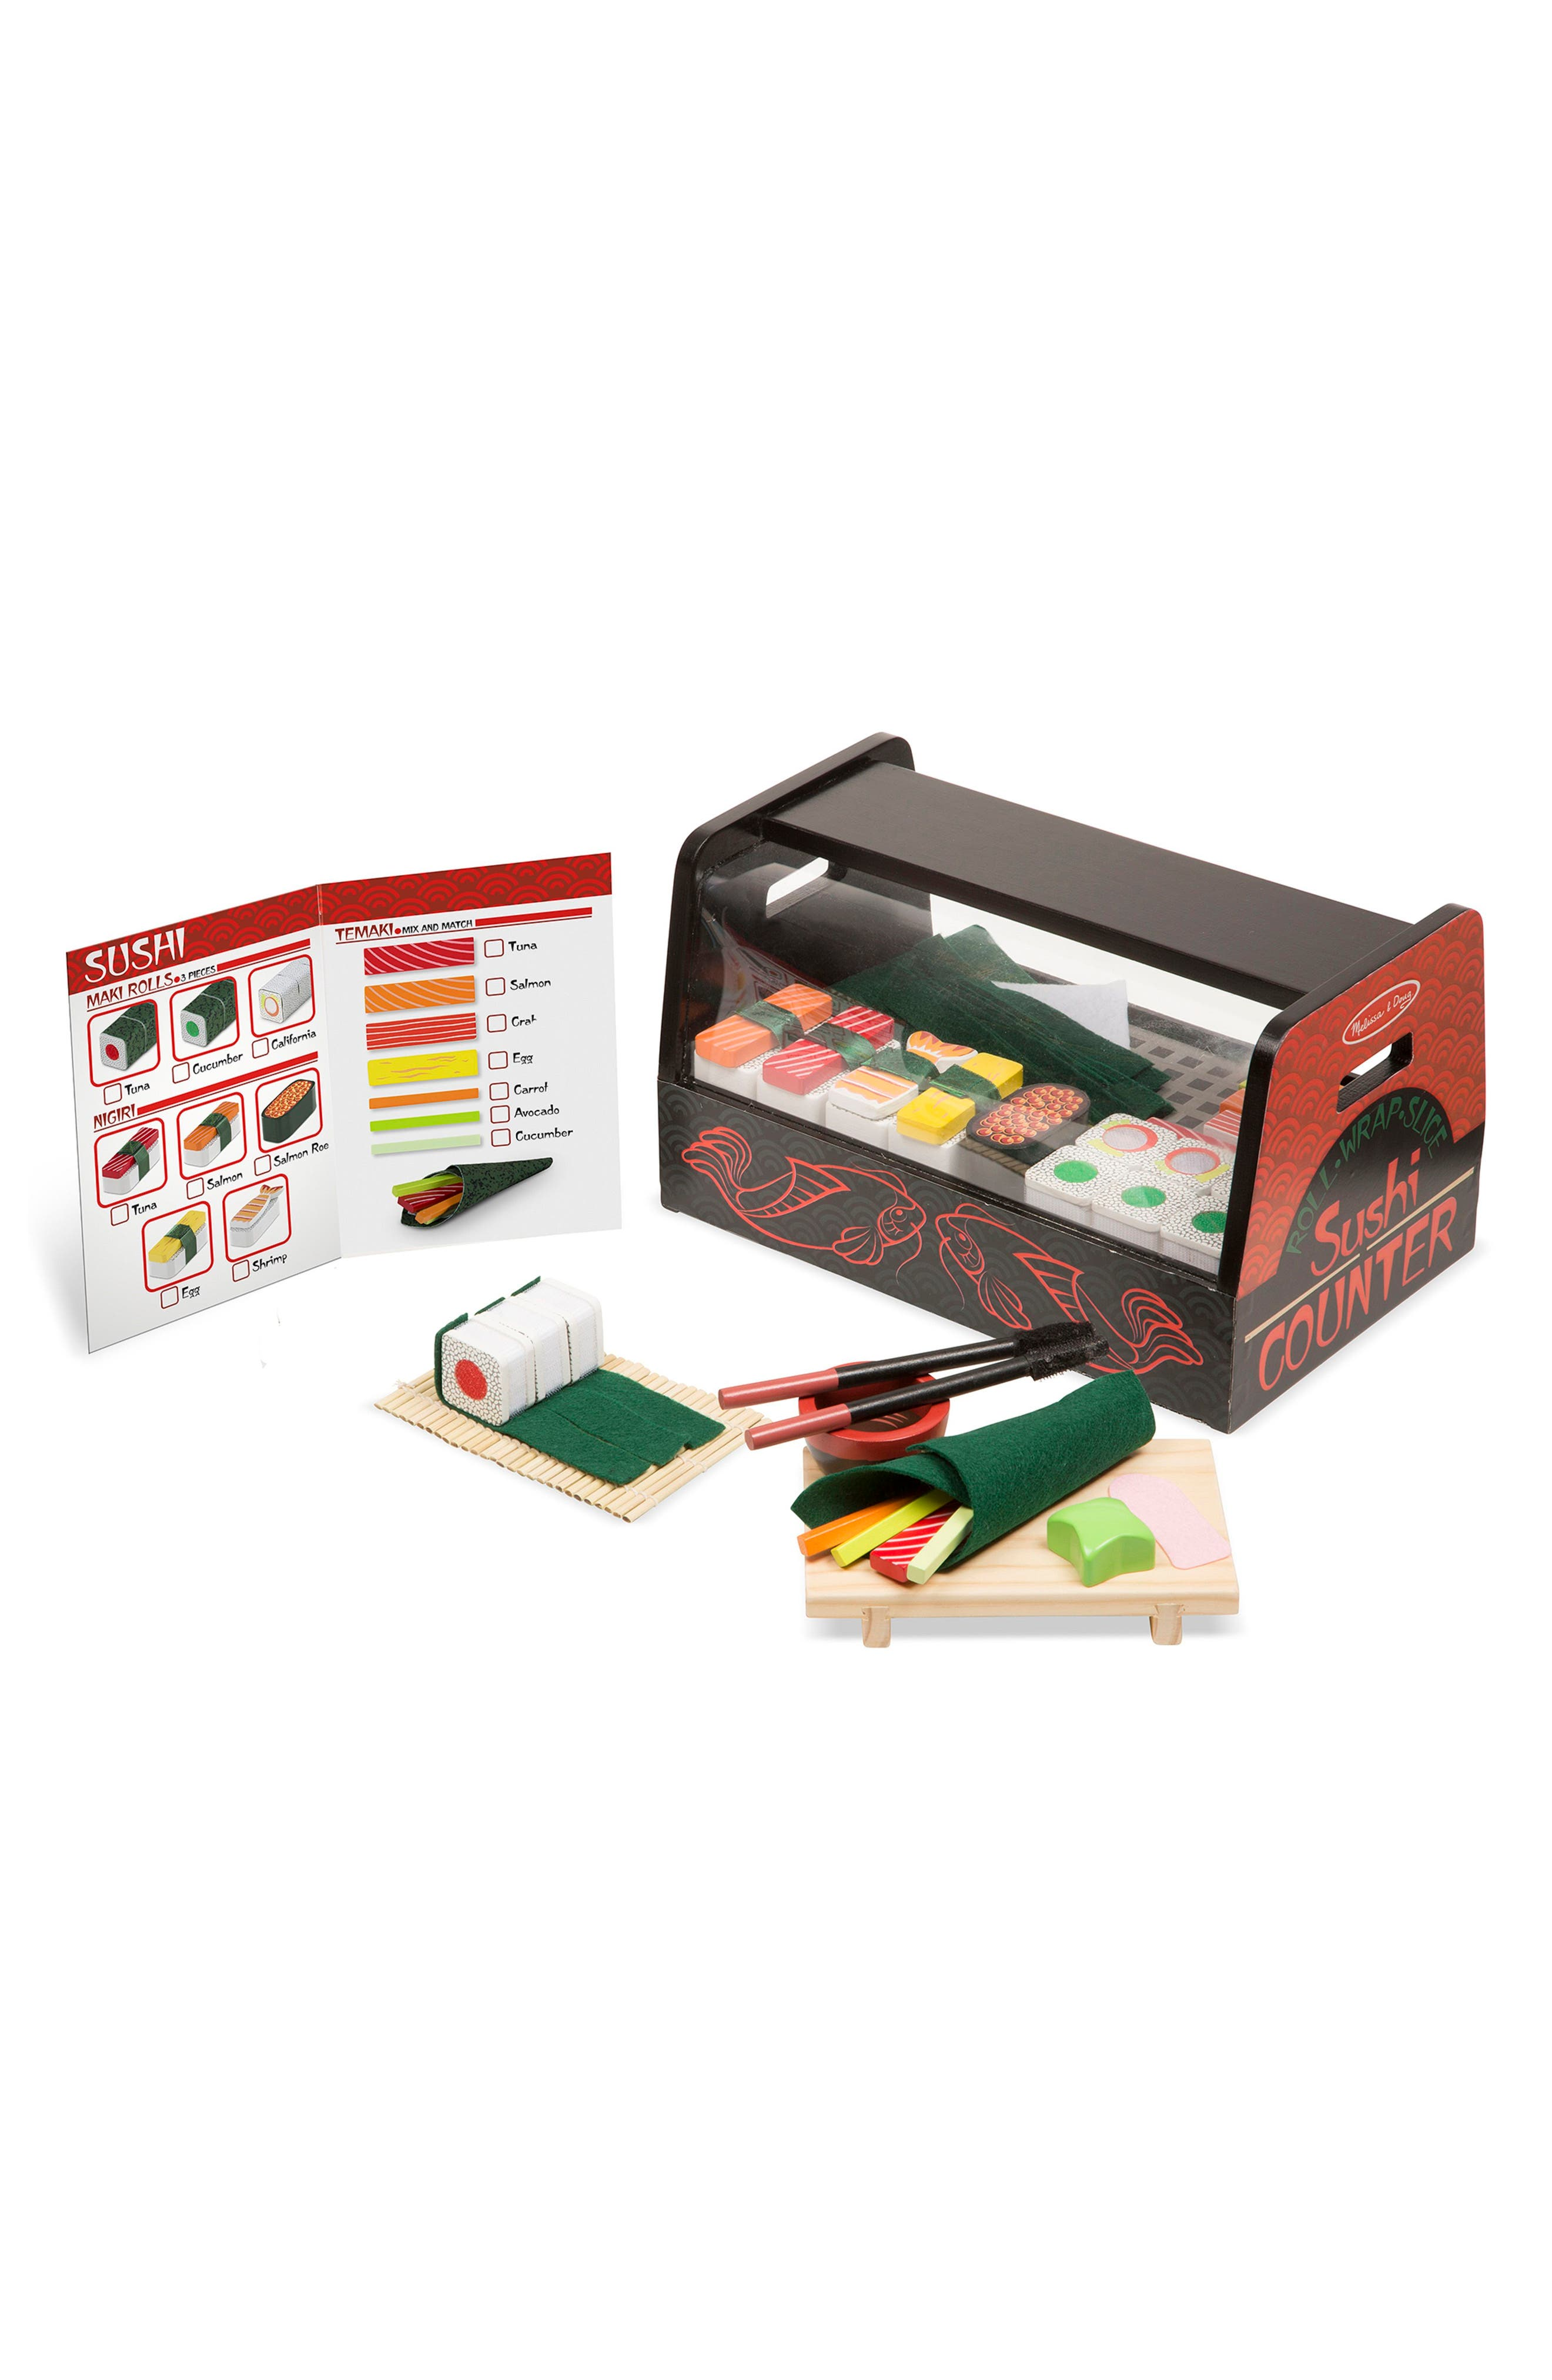 46-Piece Roll Wrap Slice Sushi Making Play Set,                             Main thumbnail 1, color,                             MULTI